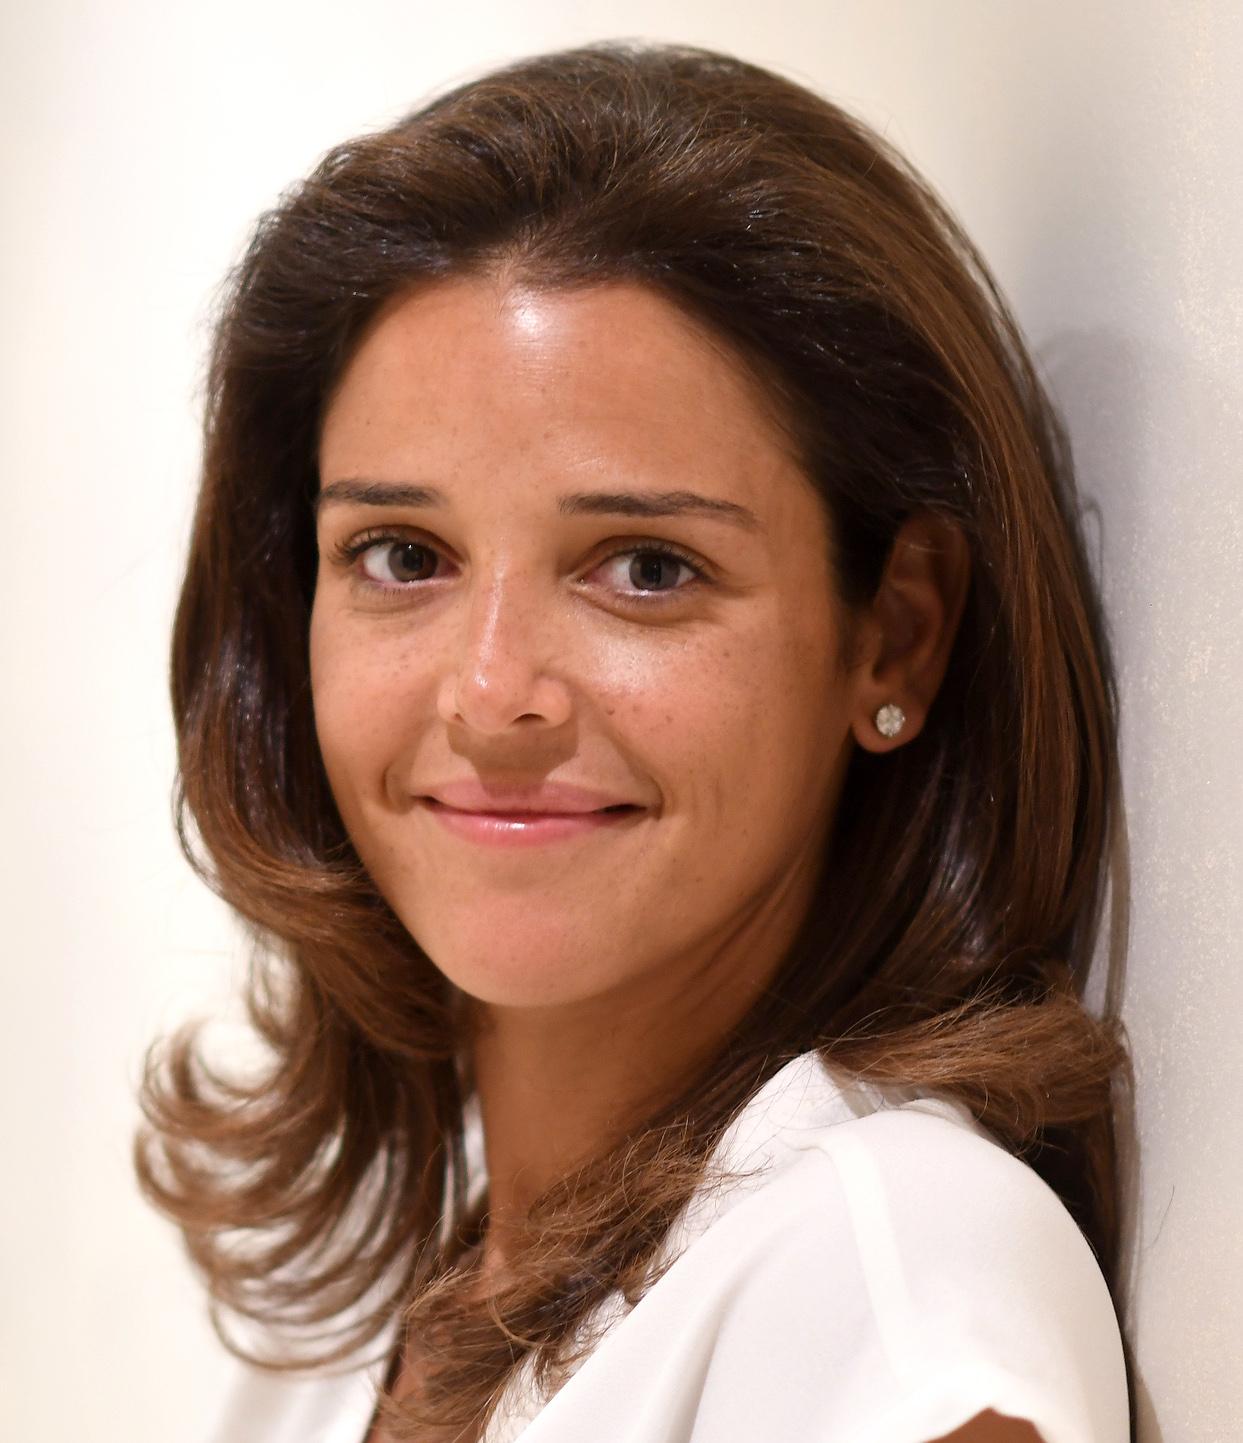 Dr. Nadine Hachach-Haram